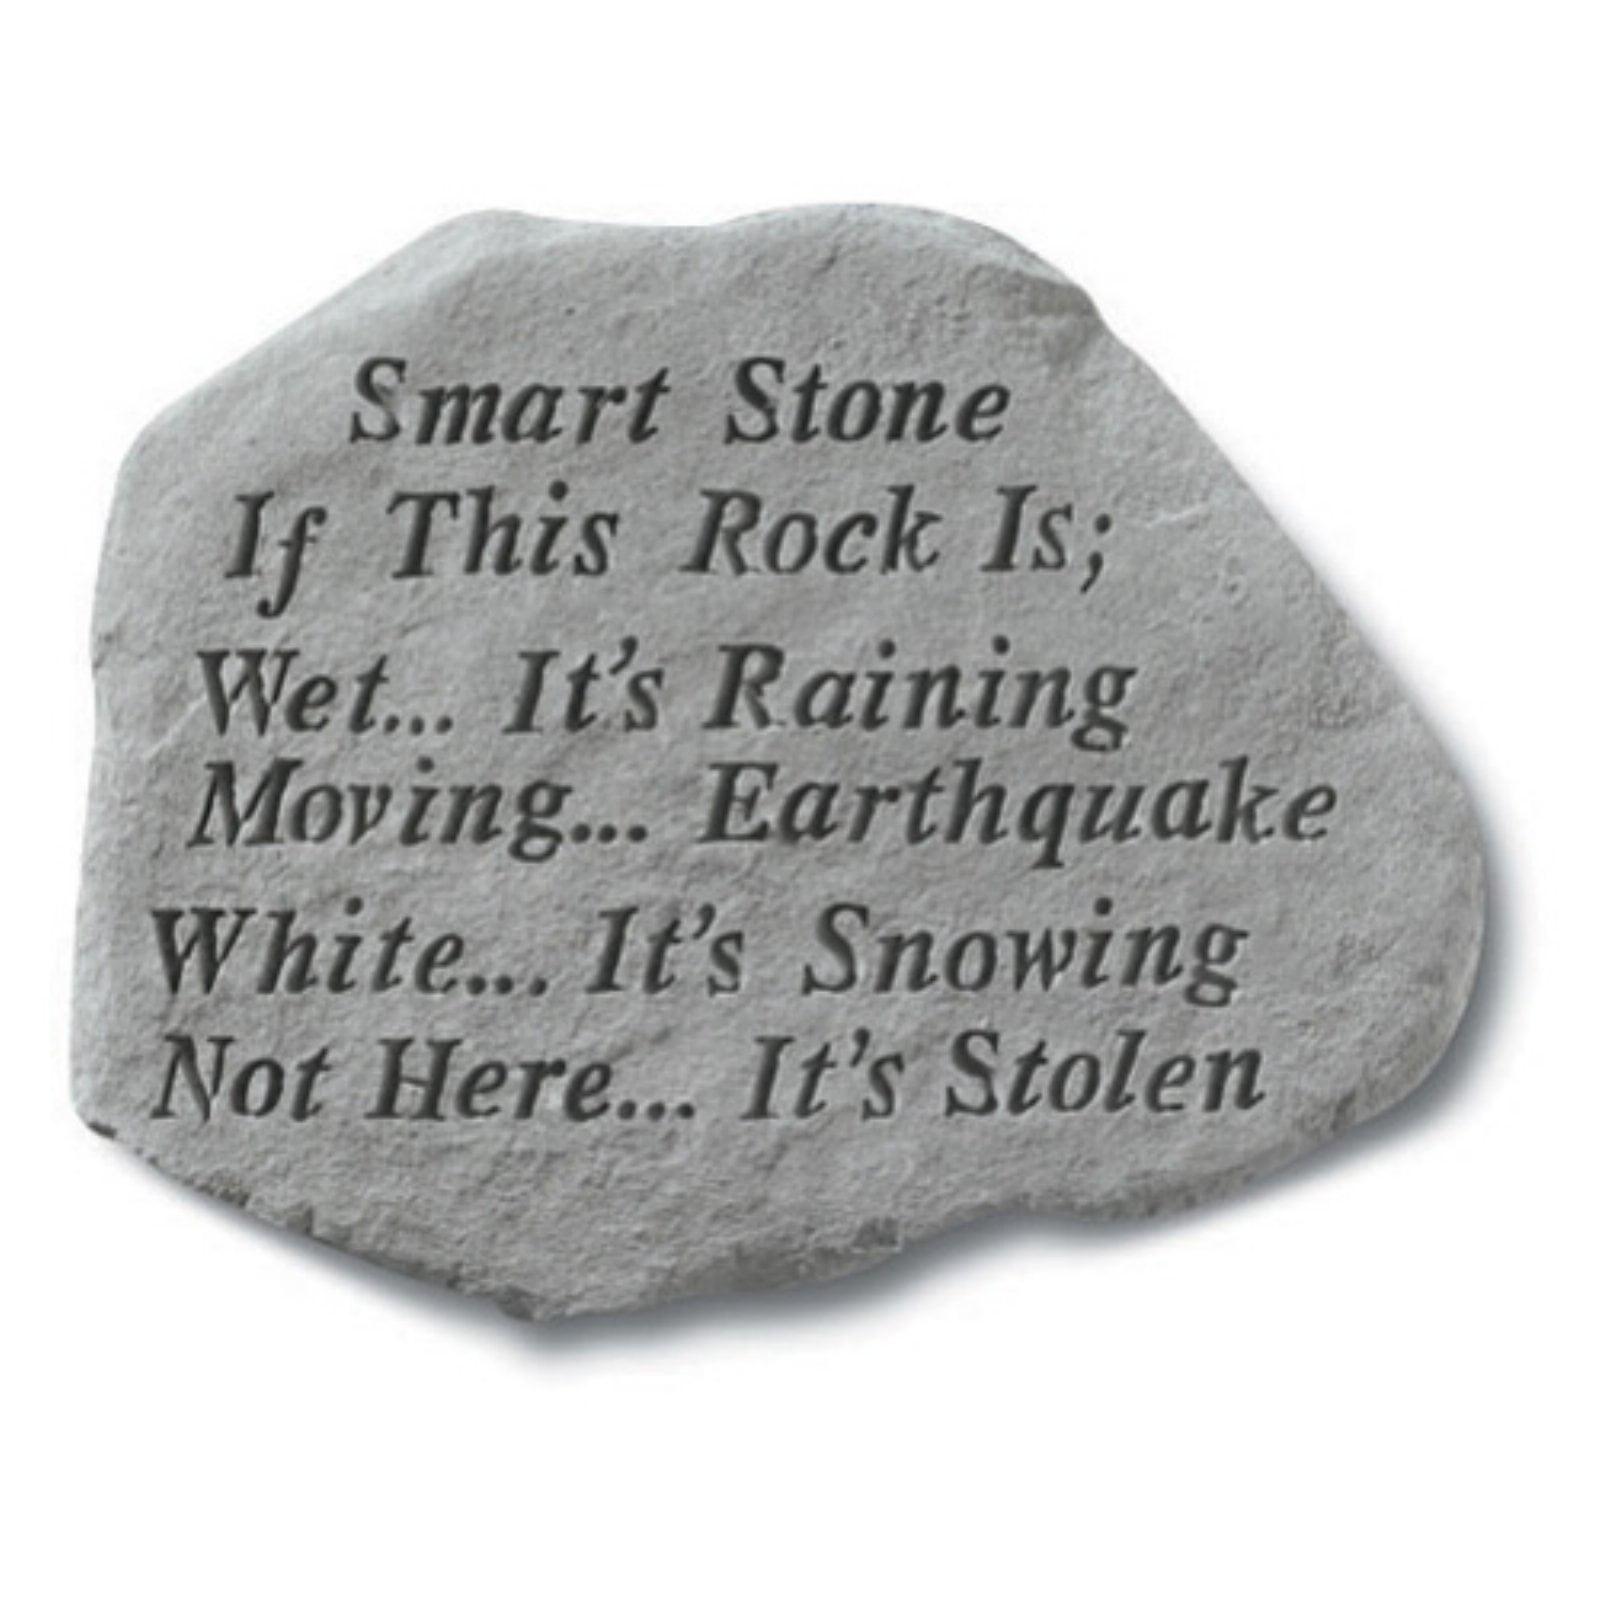 Smart Stone Garden Accent Stone